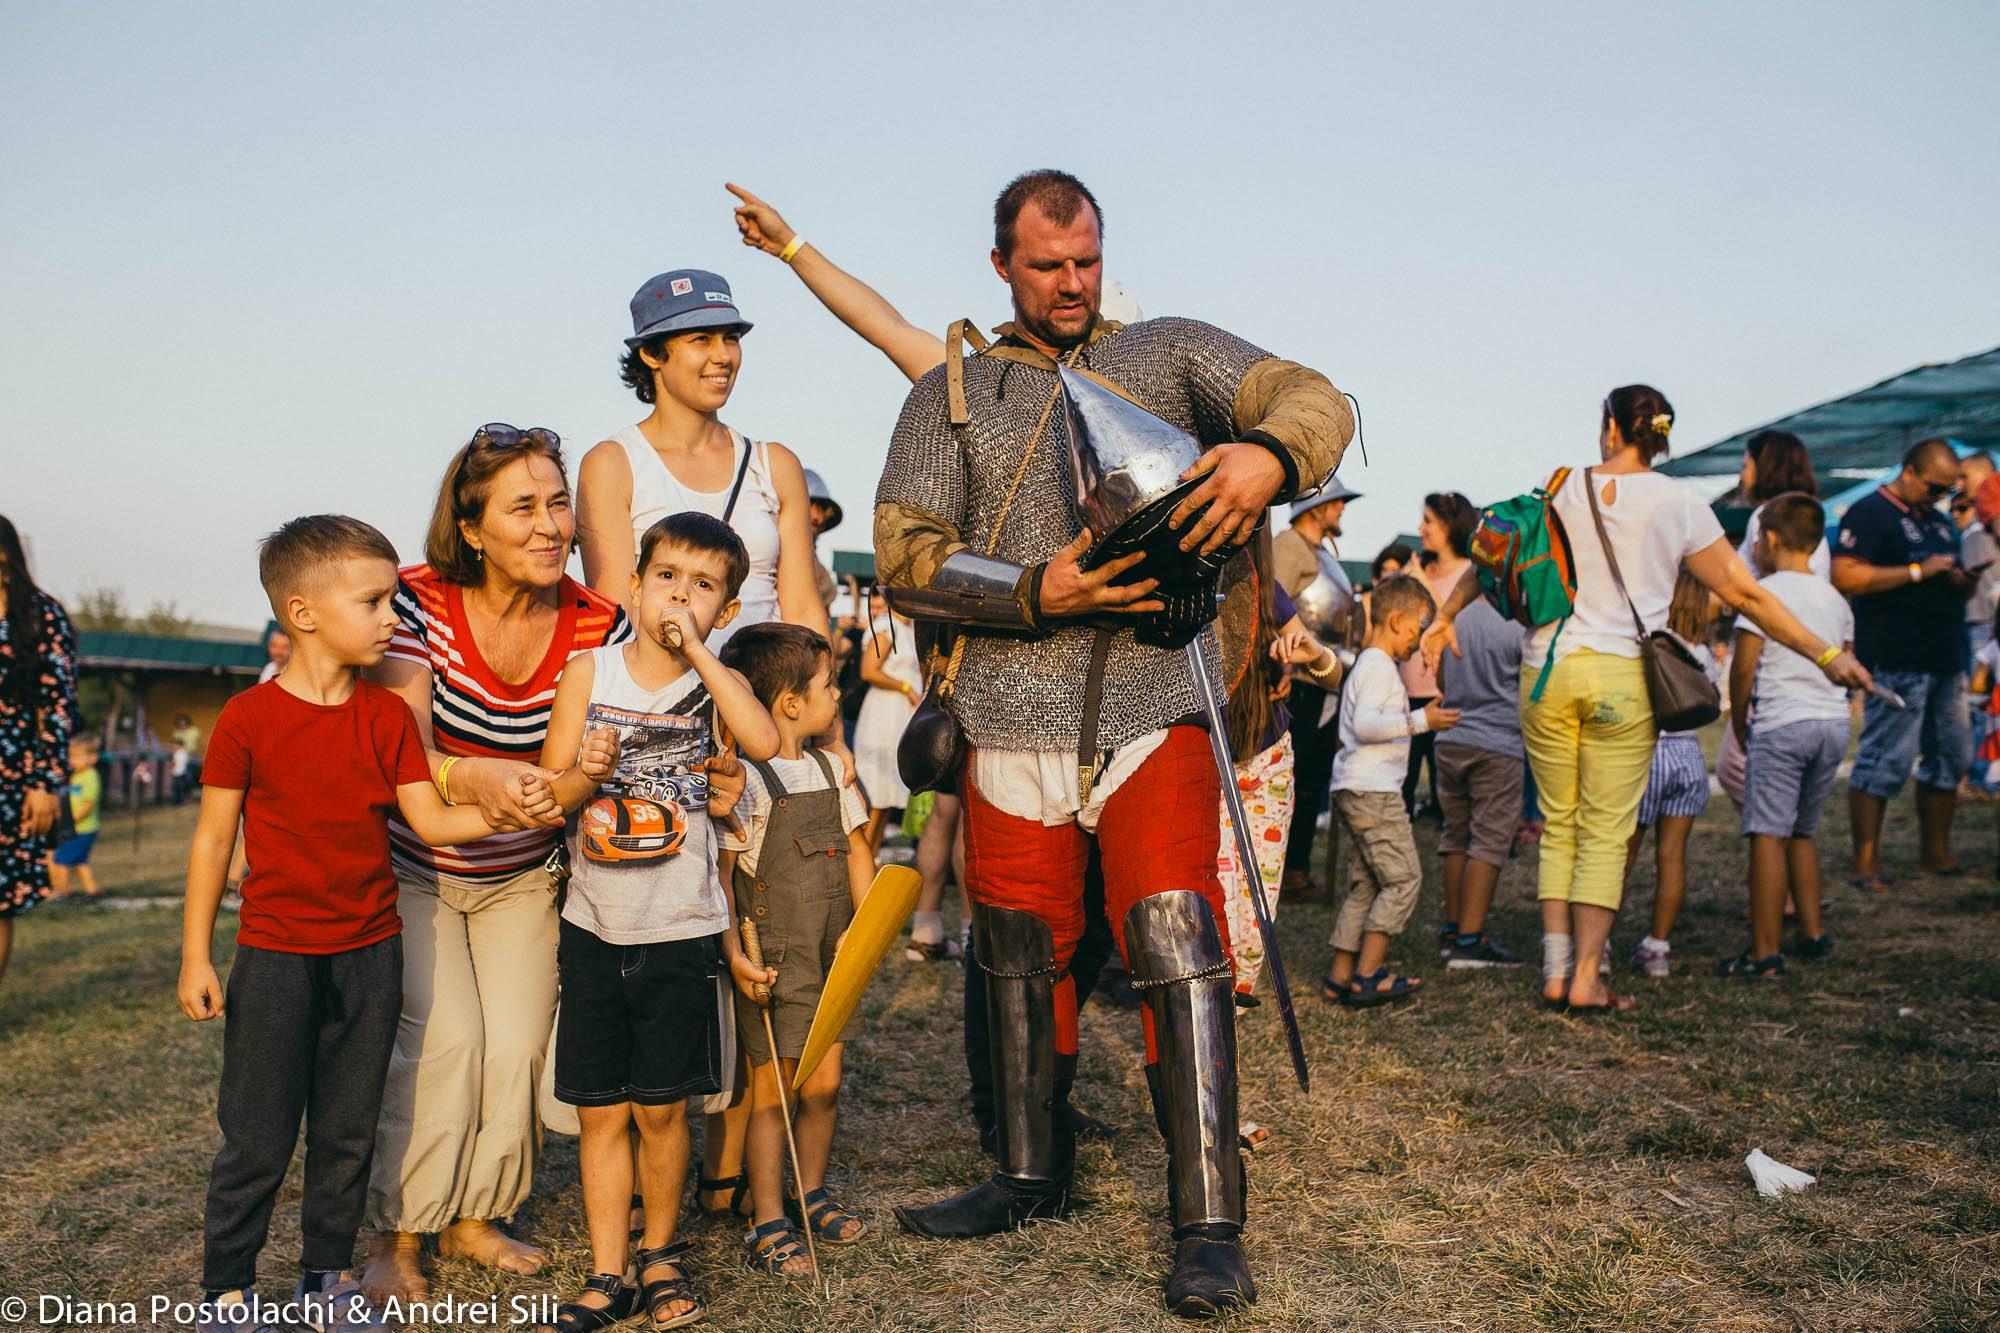 foto cu cavaleri festival medieval 2018 vatra md